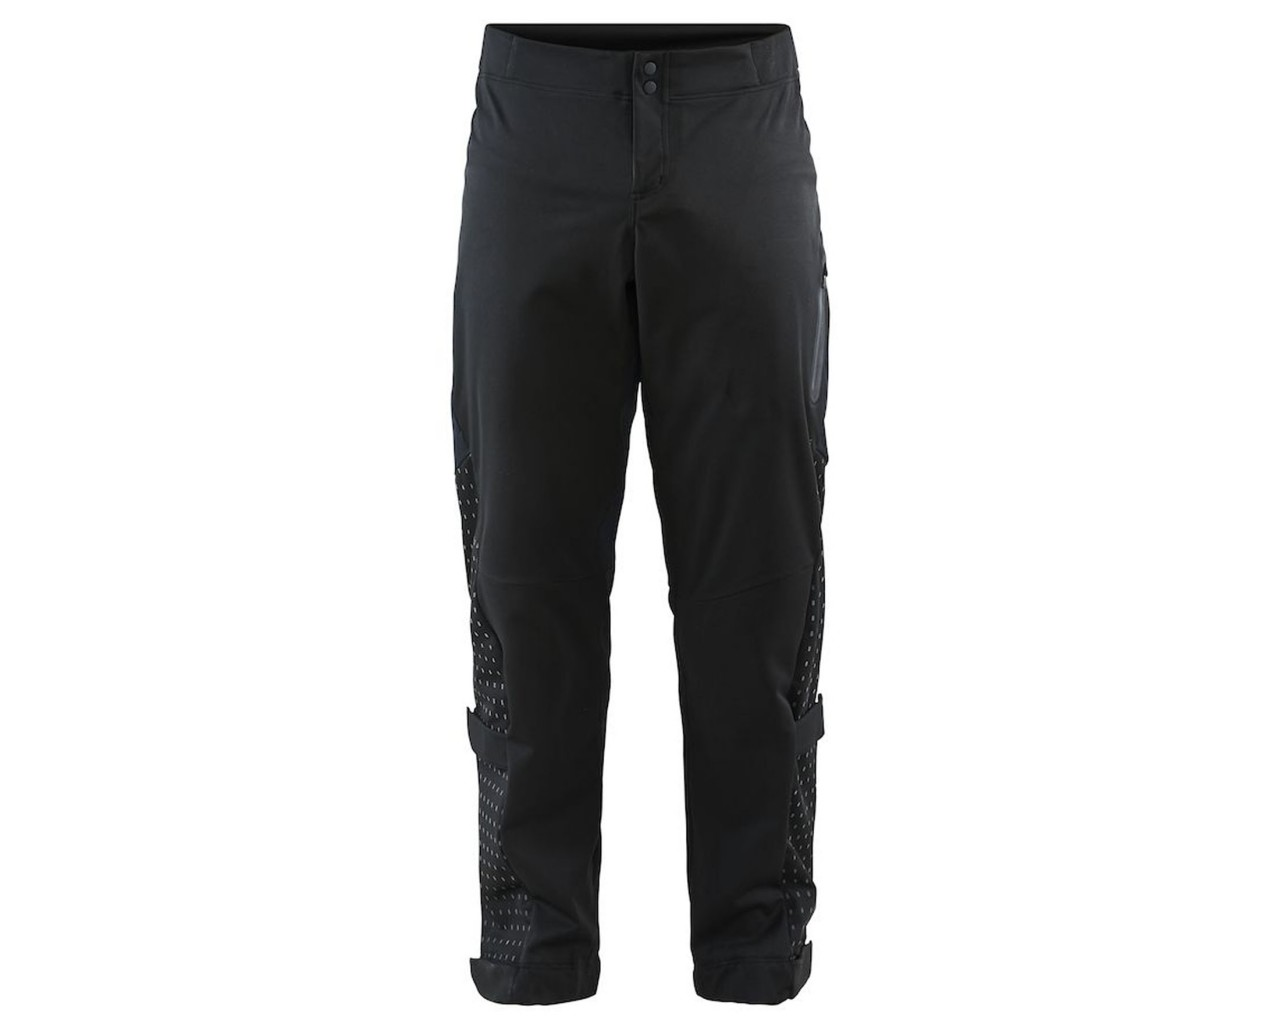 Craft Hale Hydro Pants - wind/water-repellent Pants | black